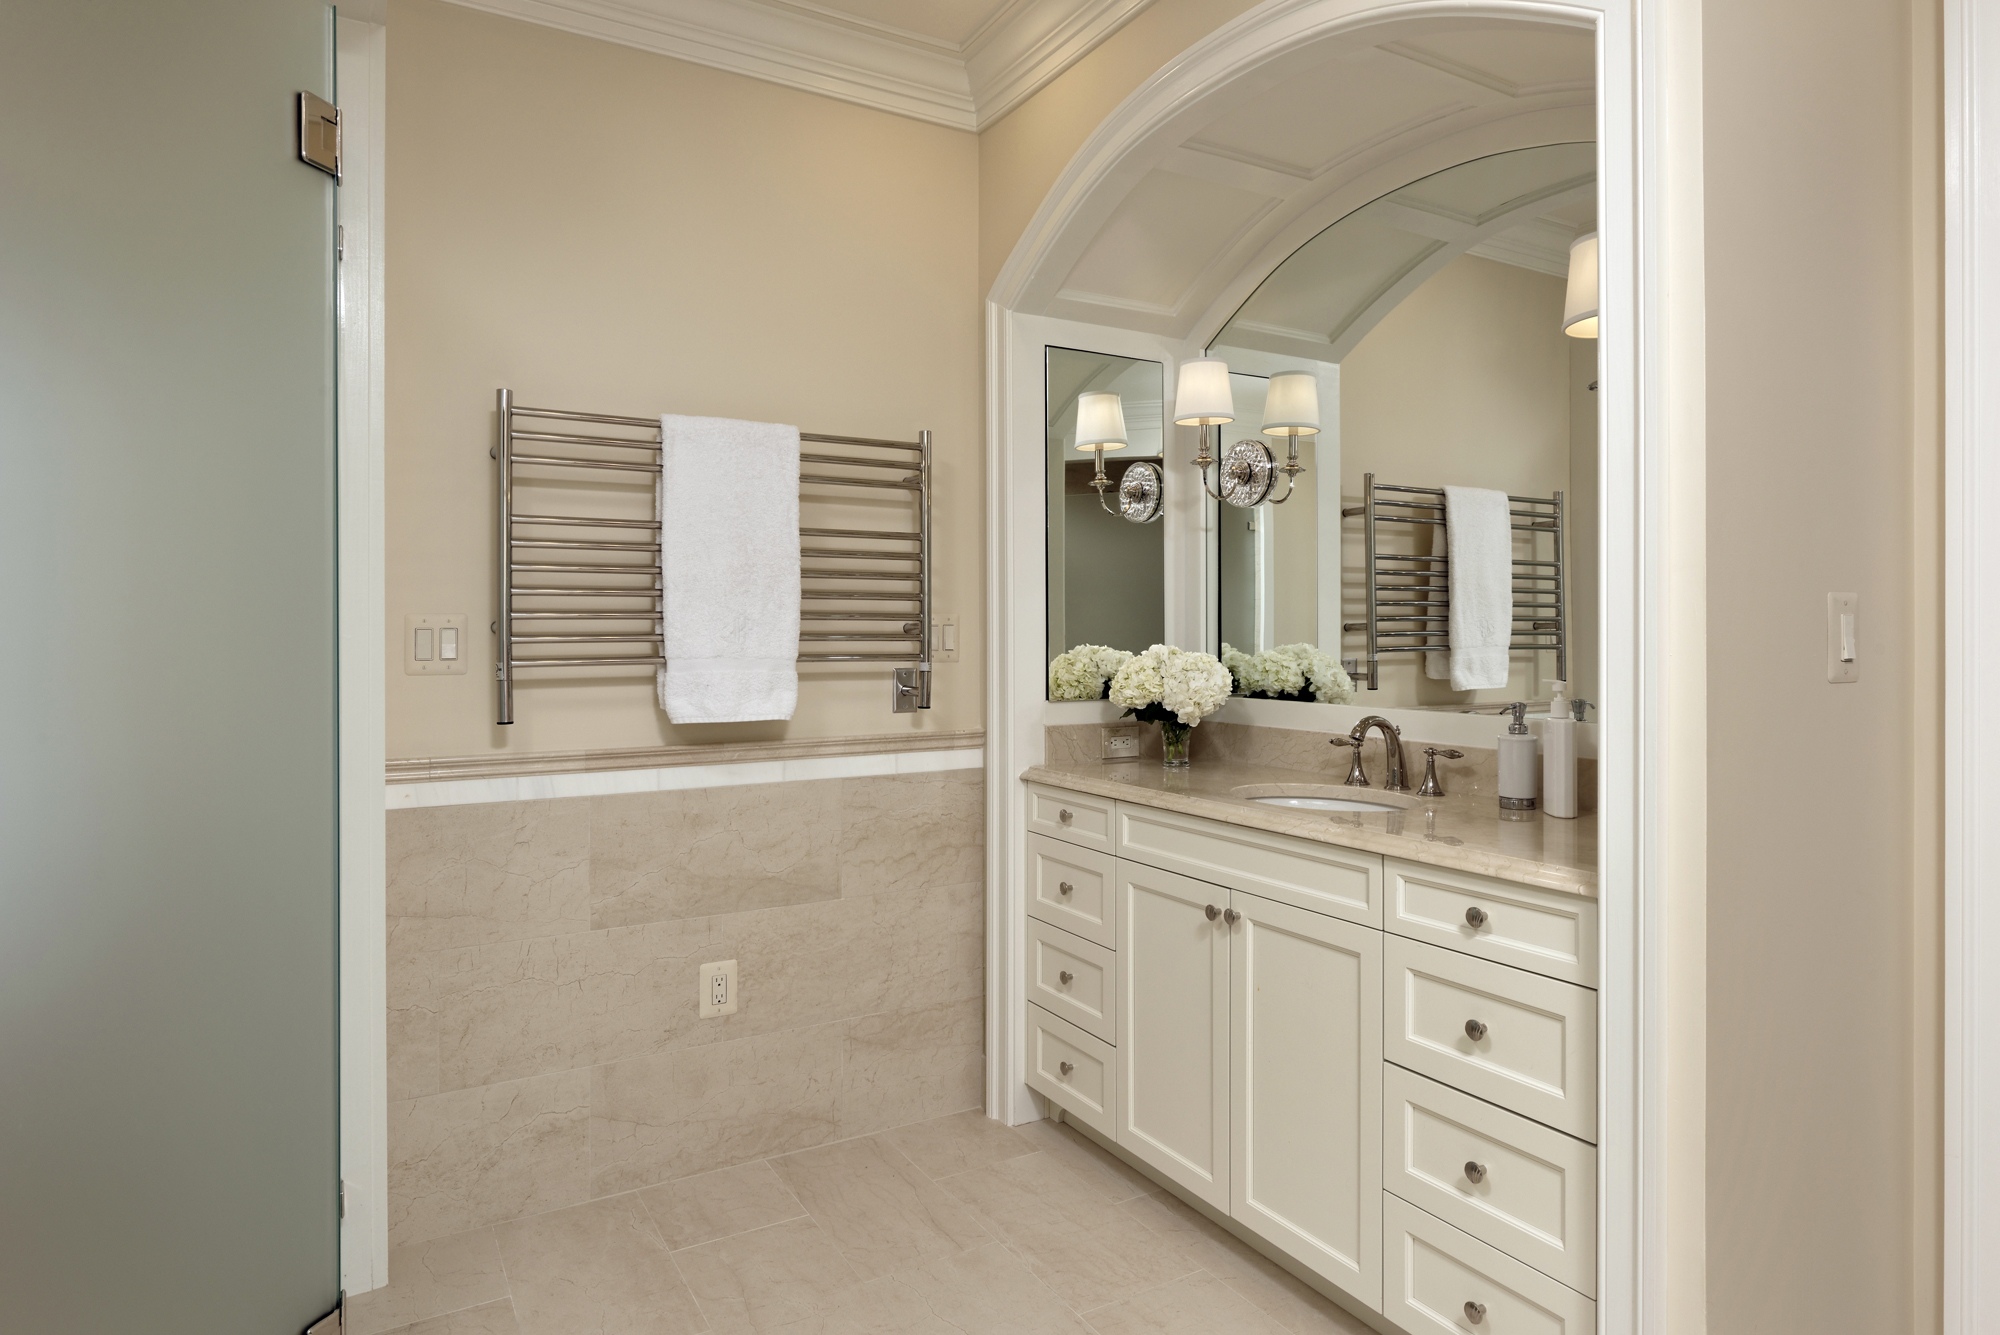 bowa design build renovation in mclean va kitchen bath office bethesda md - Bathroom Remodeling Bethesda Md